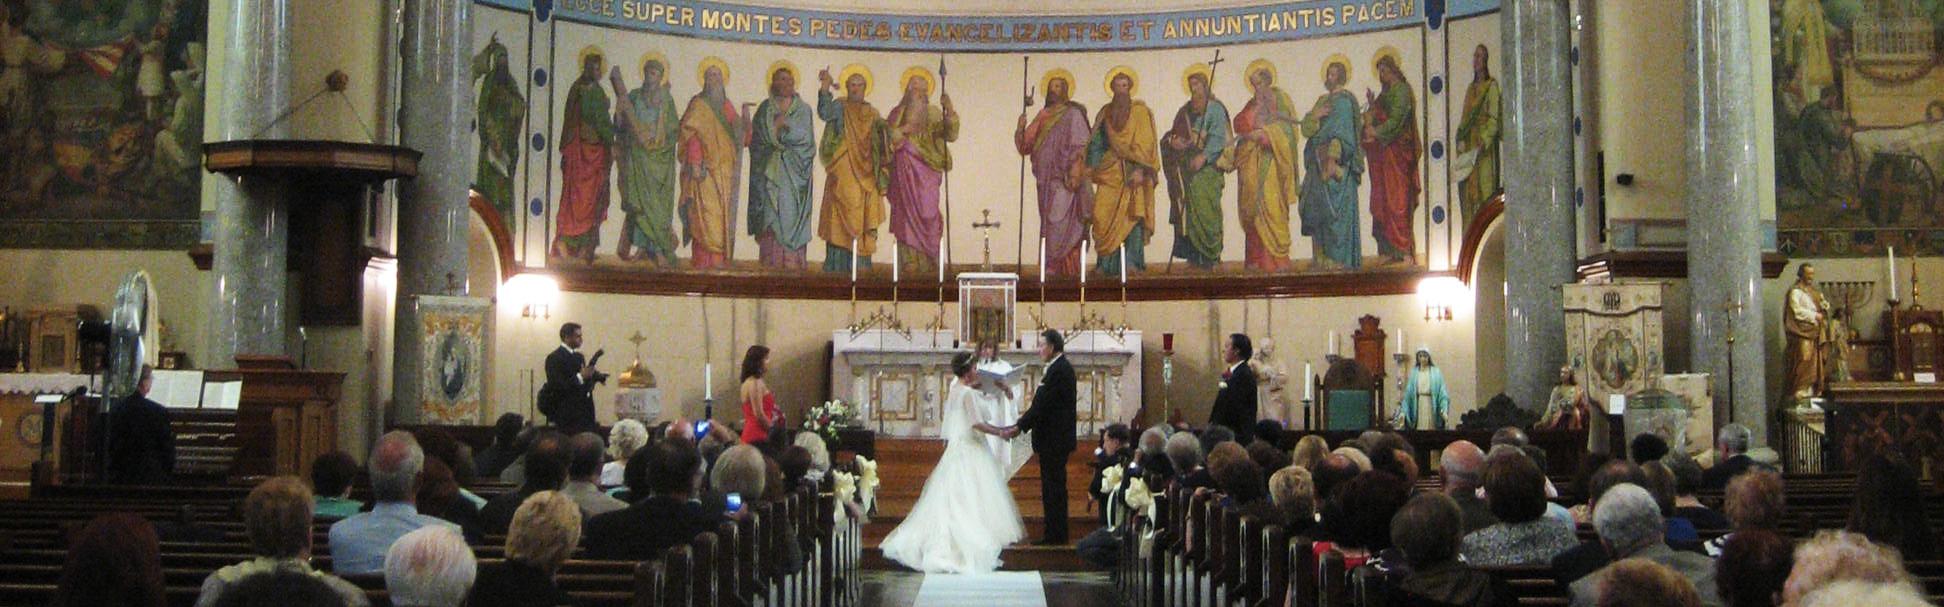 wedding_hero-01.jpg